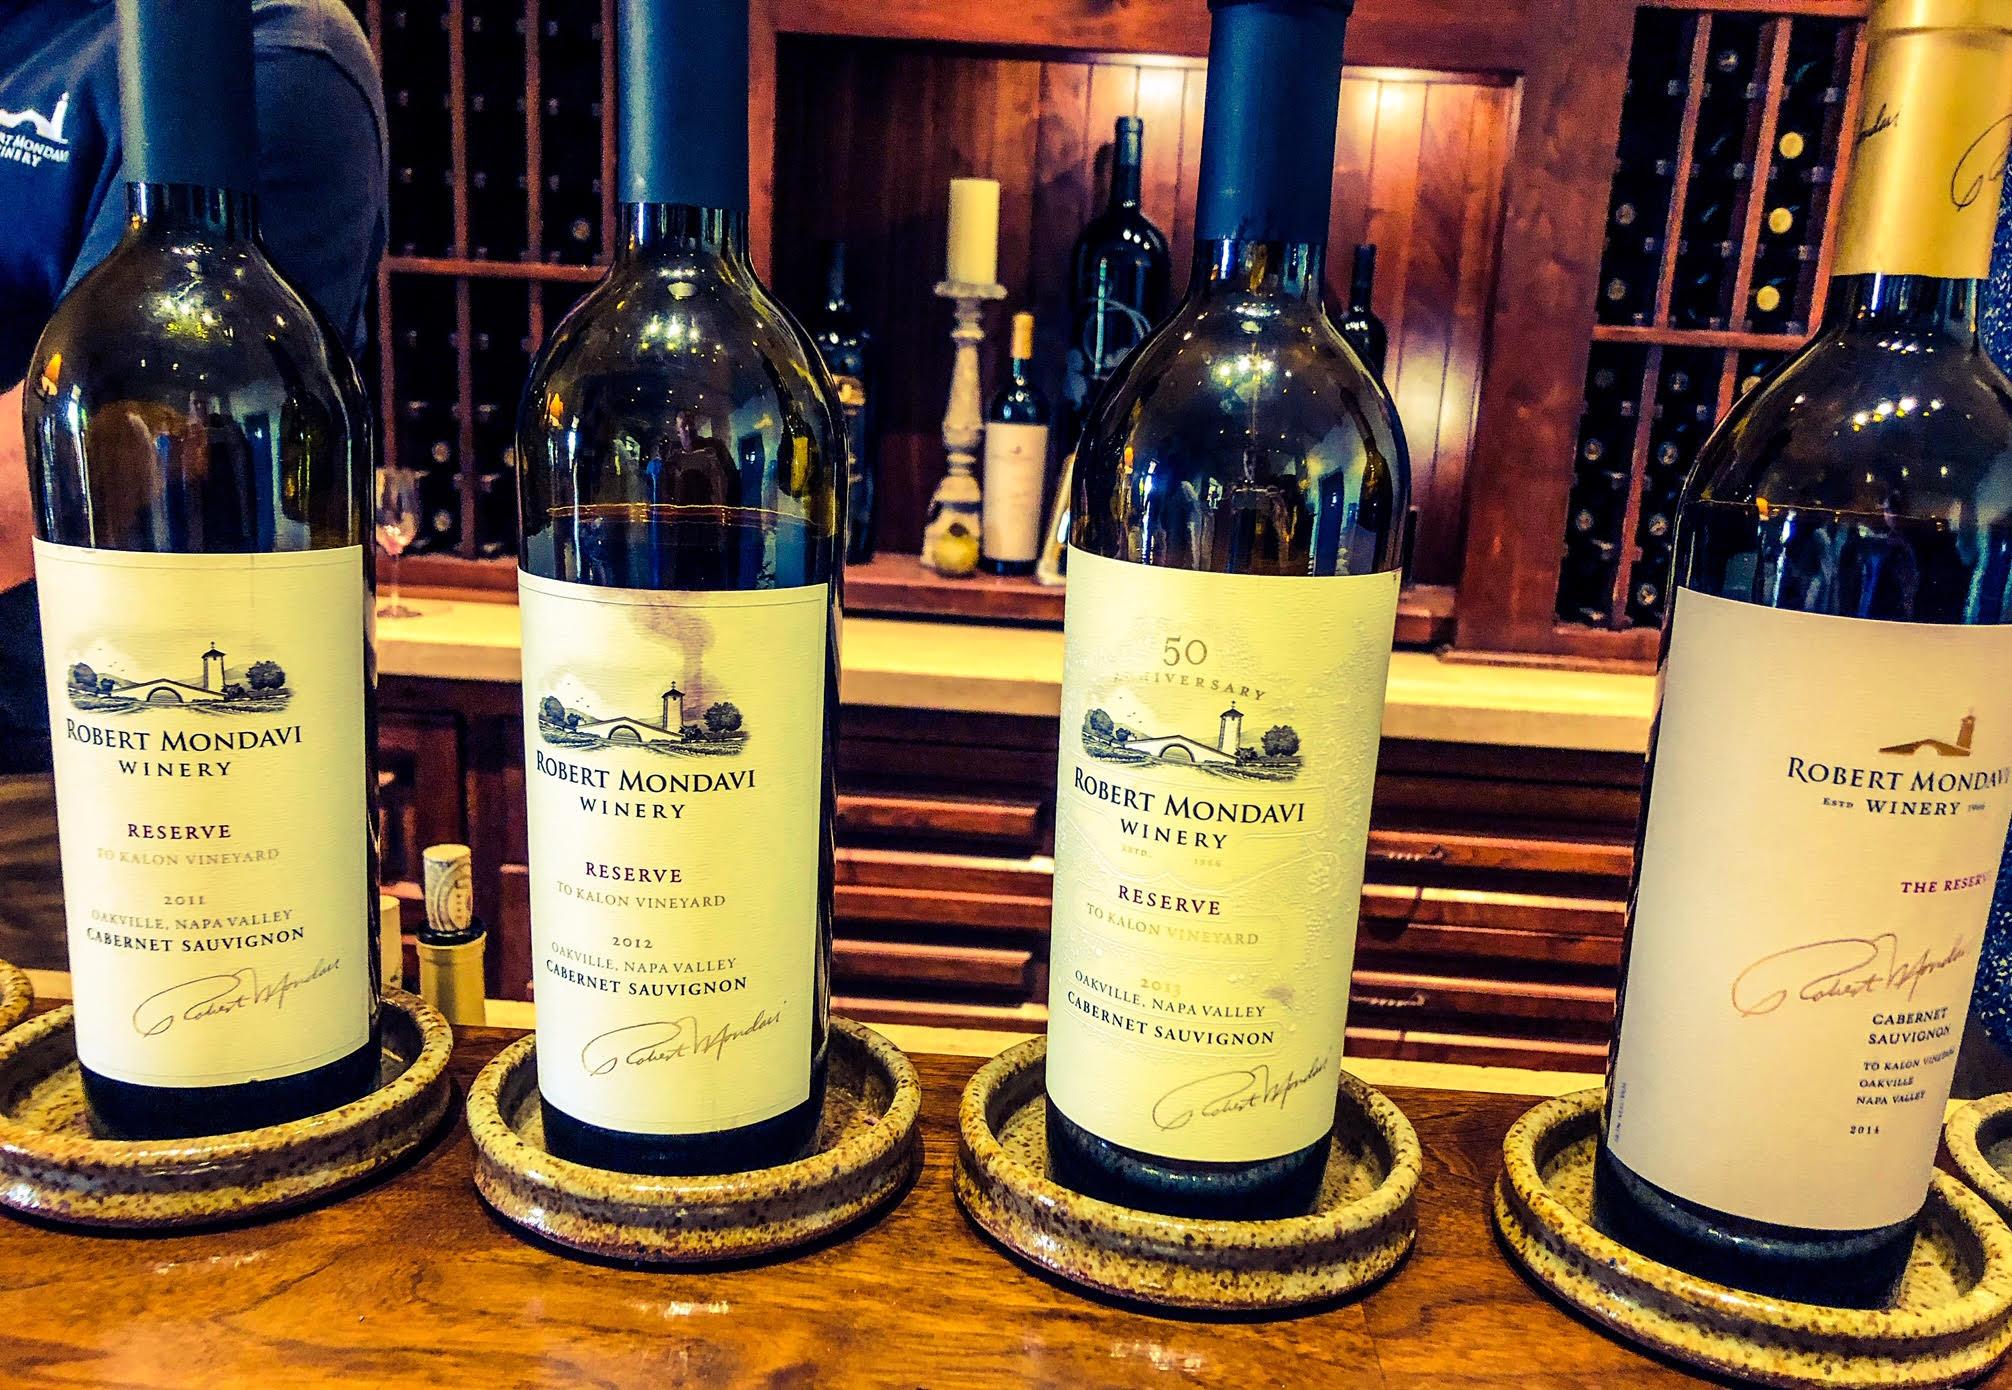 Robert Mondavi Winery 'Reserve' Vertical Tasting.jpg